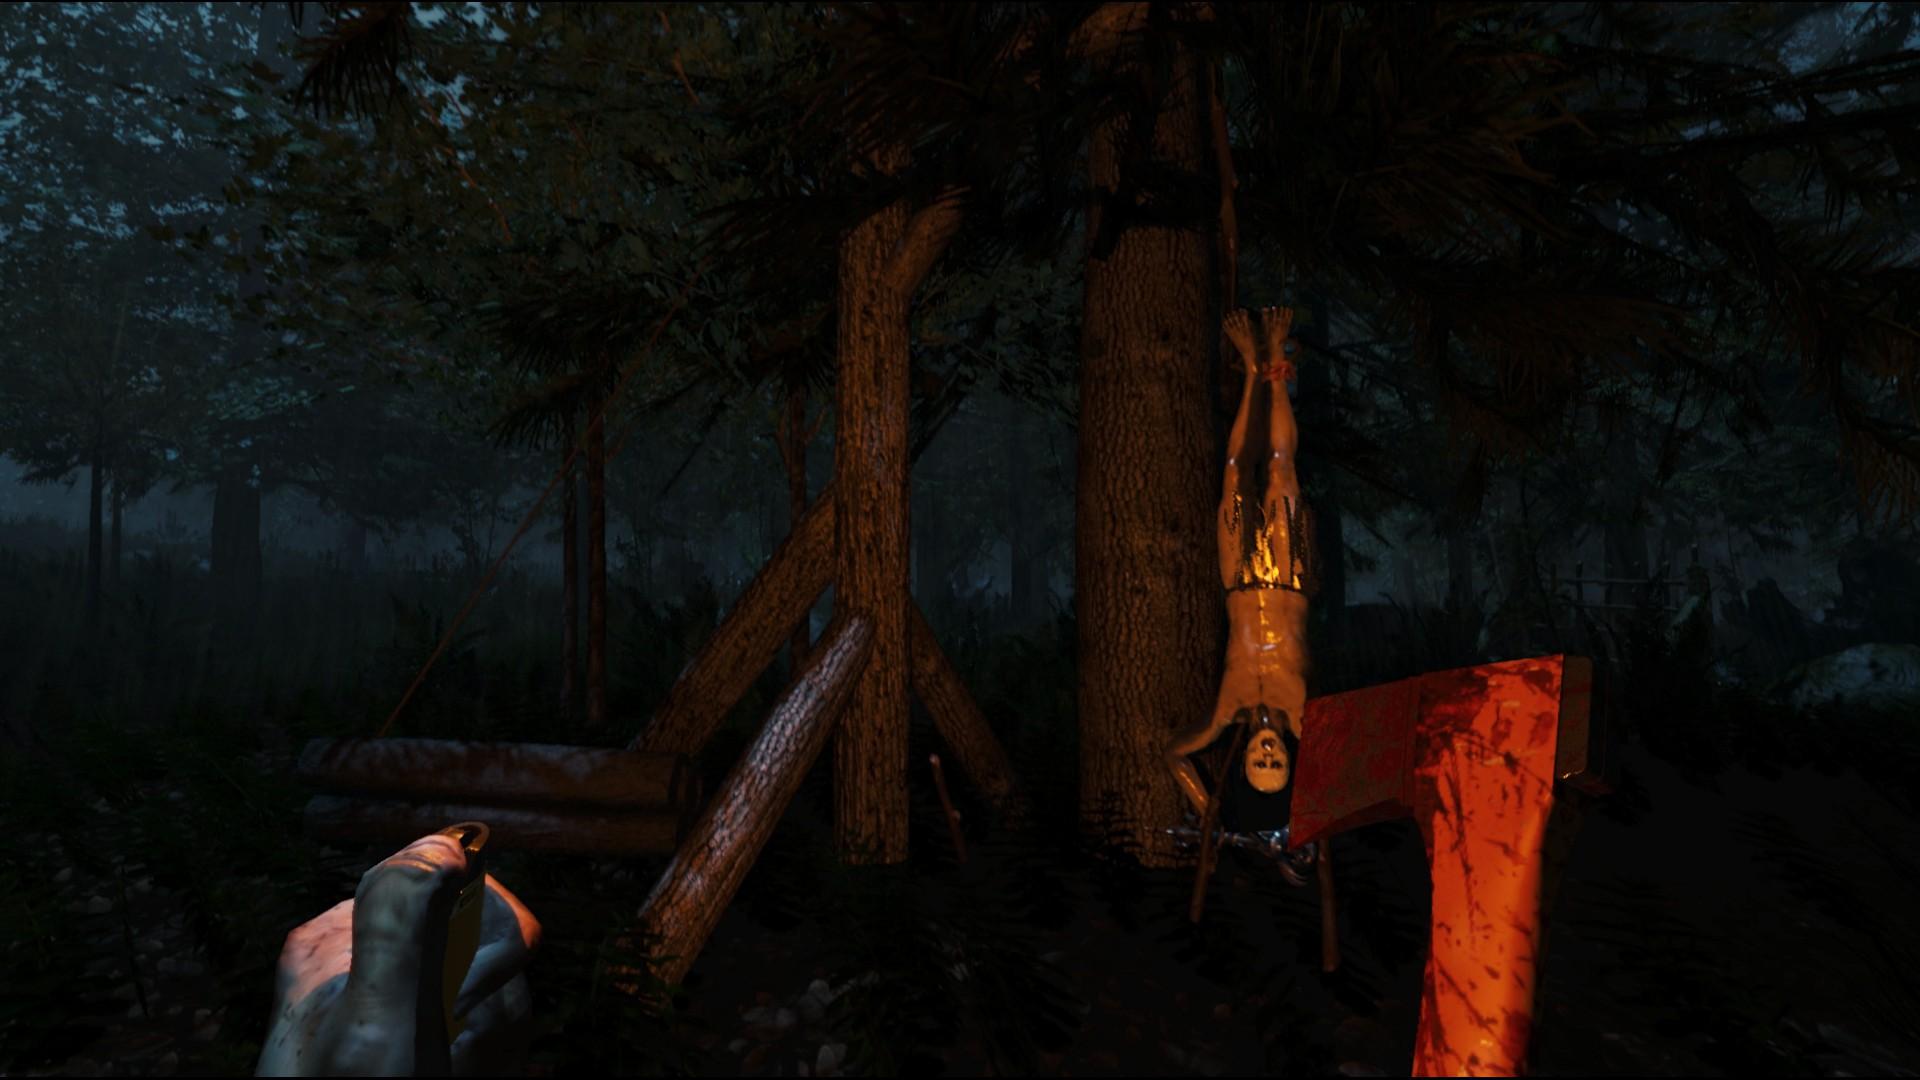 The Forest Mennsch oder Mutant